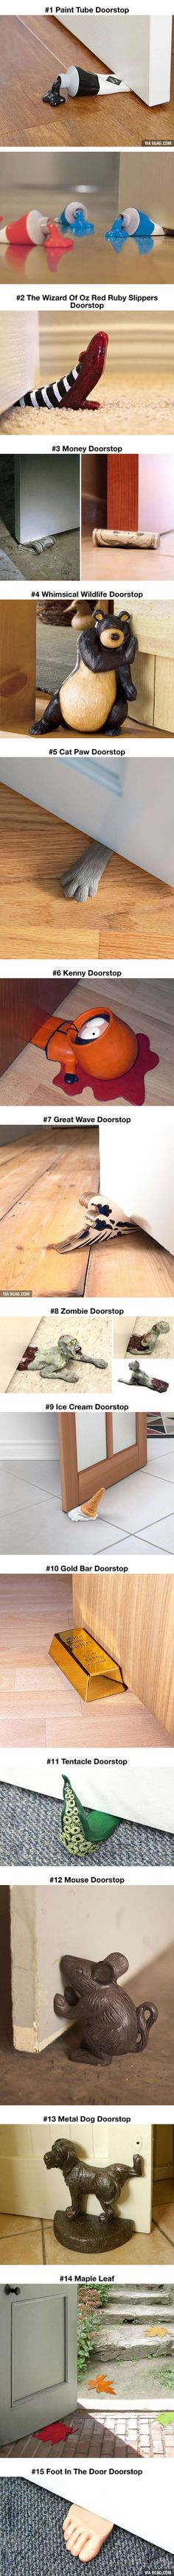 15 Fun Doorstops. You've Never Wanted A Doorstop This Much! - 9GAG